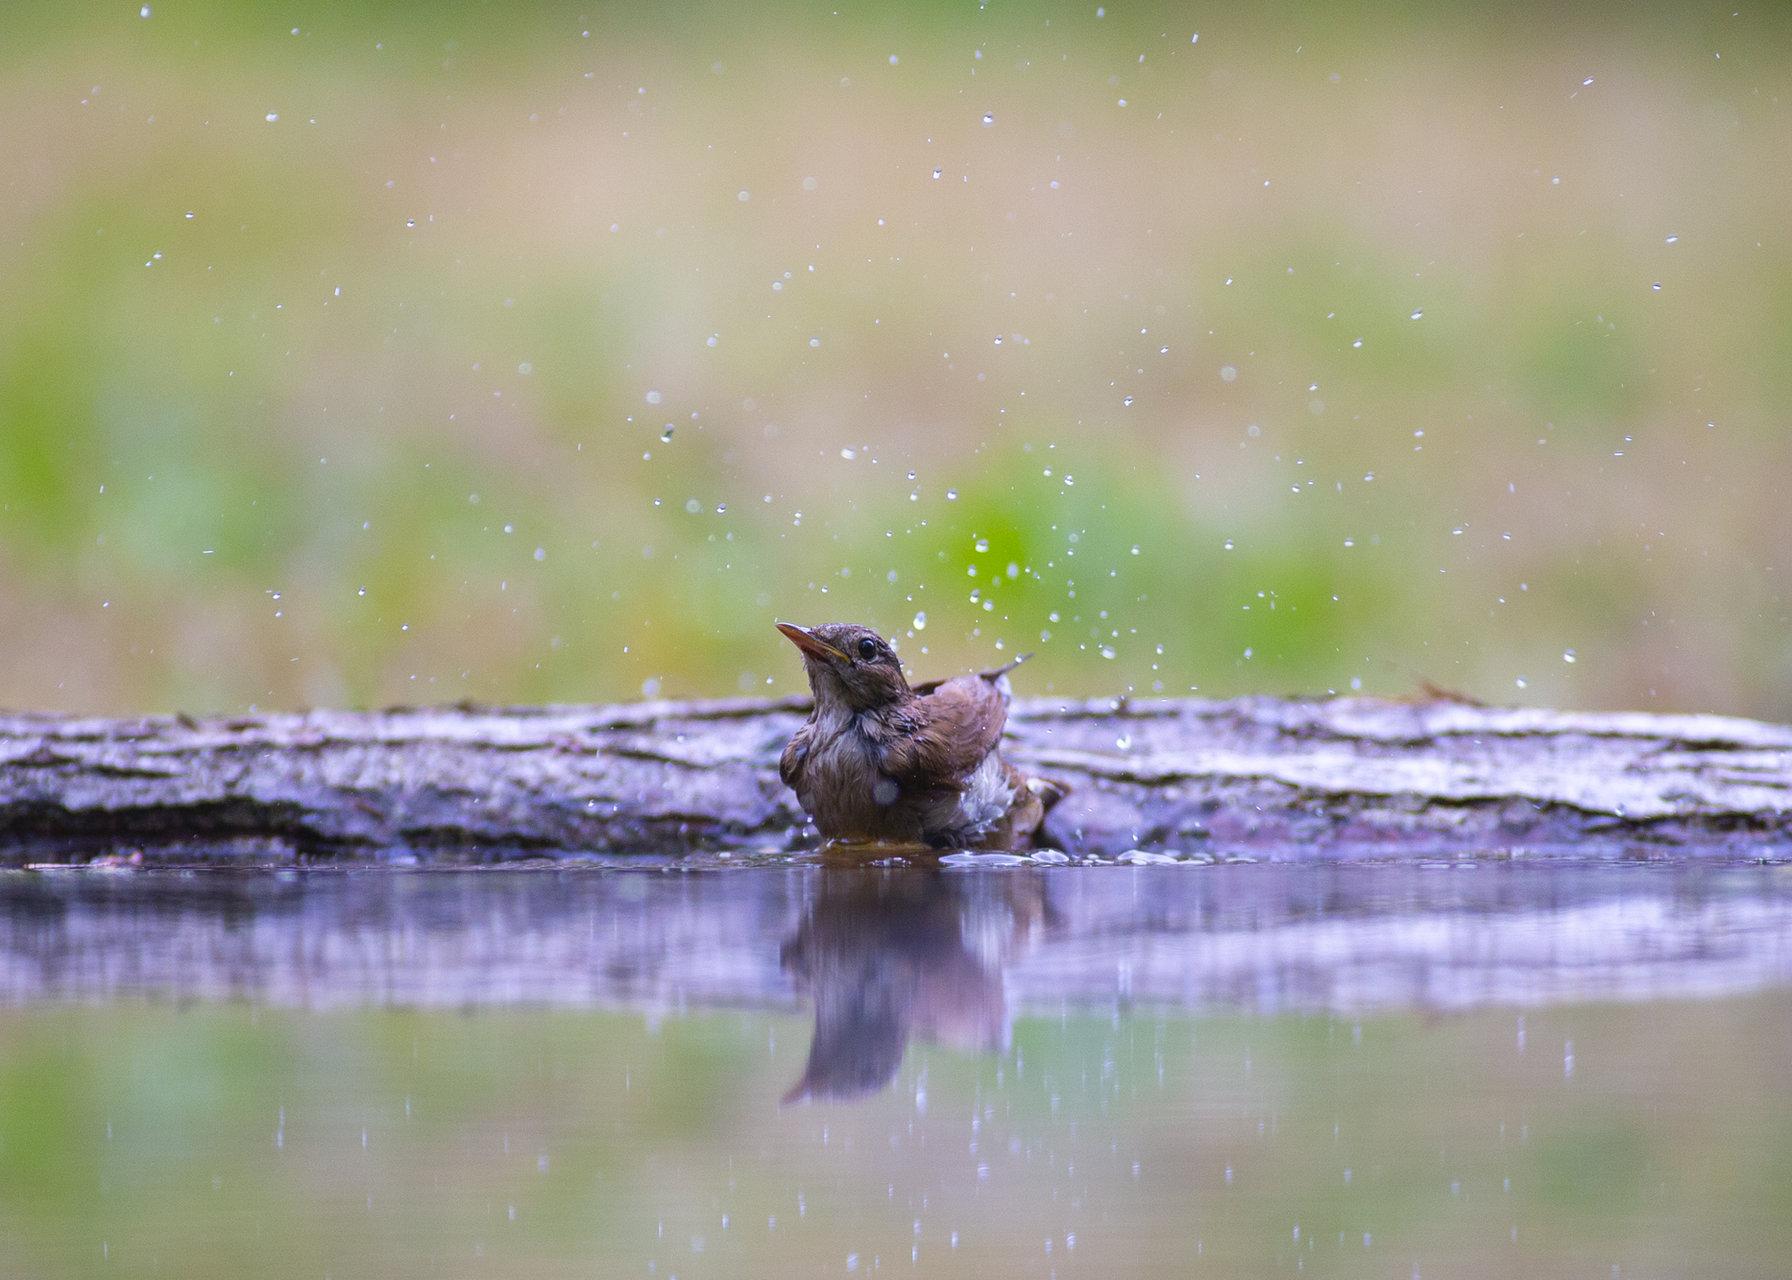 Photo in Wild life | Author Ivajlo Andreev - LorDDemoniC | PHOTO FORUM